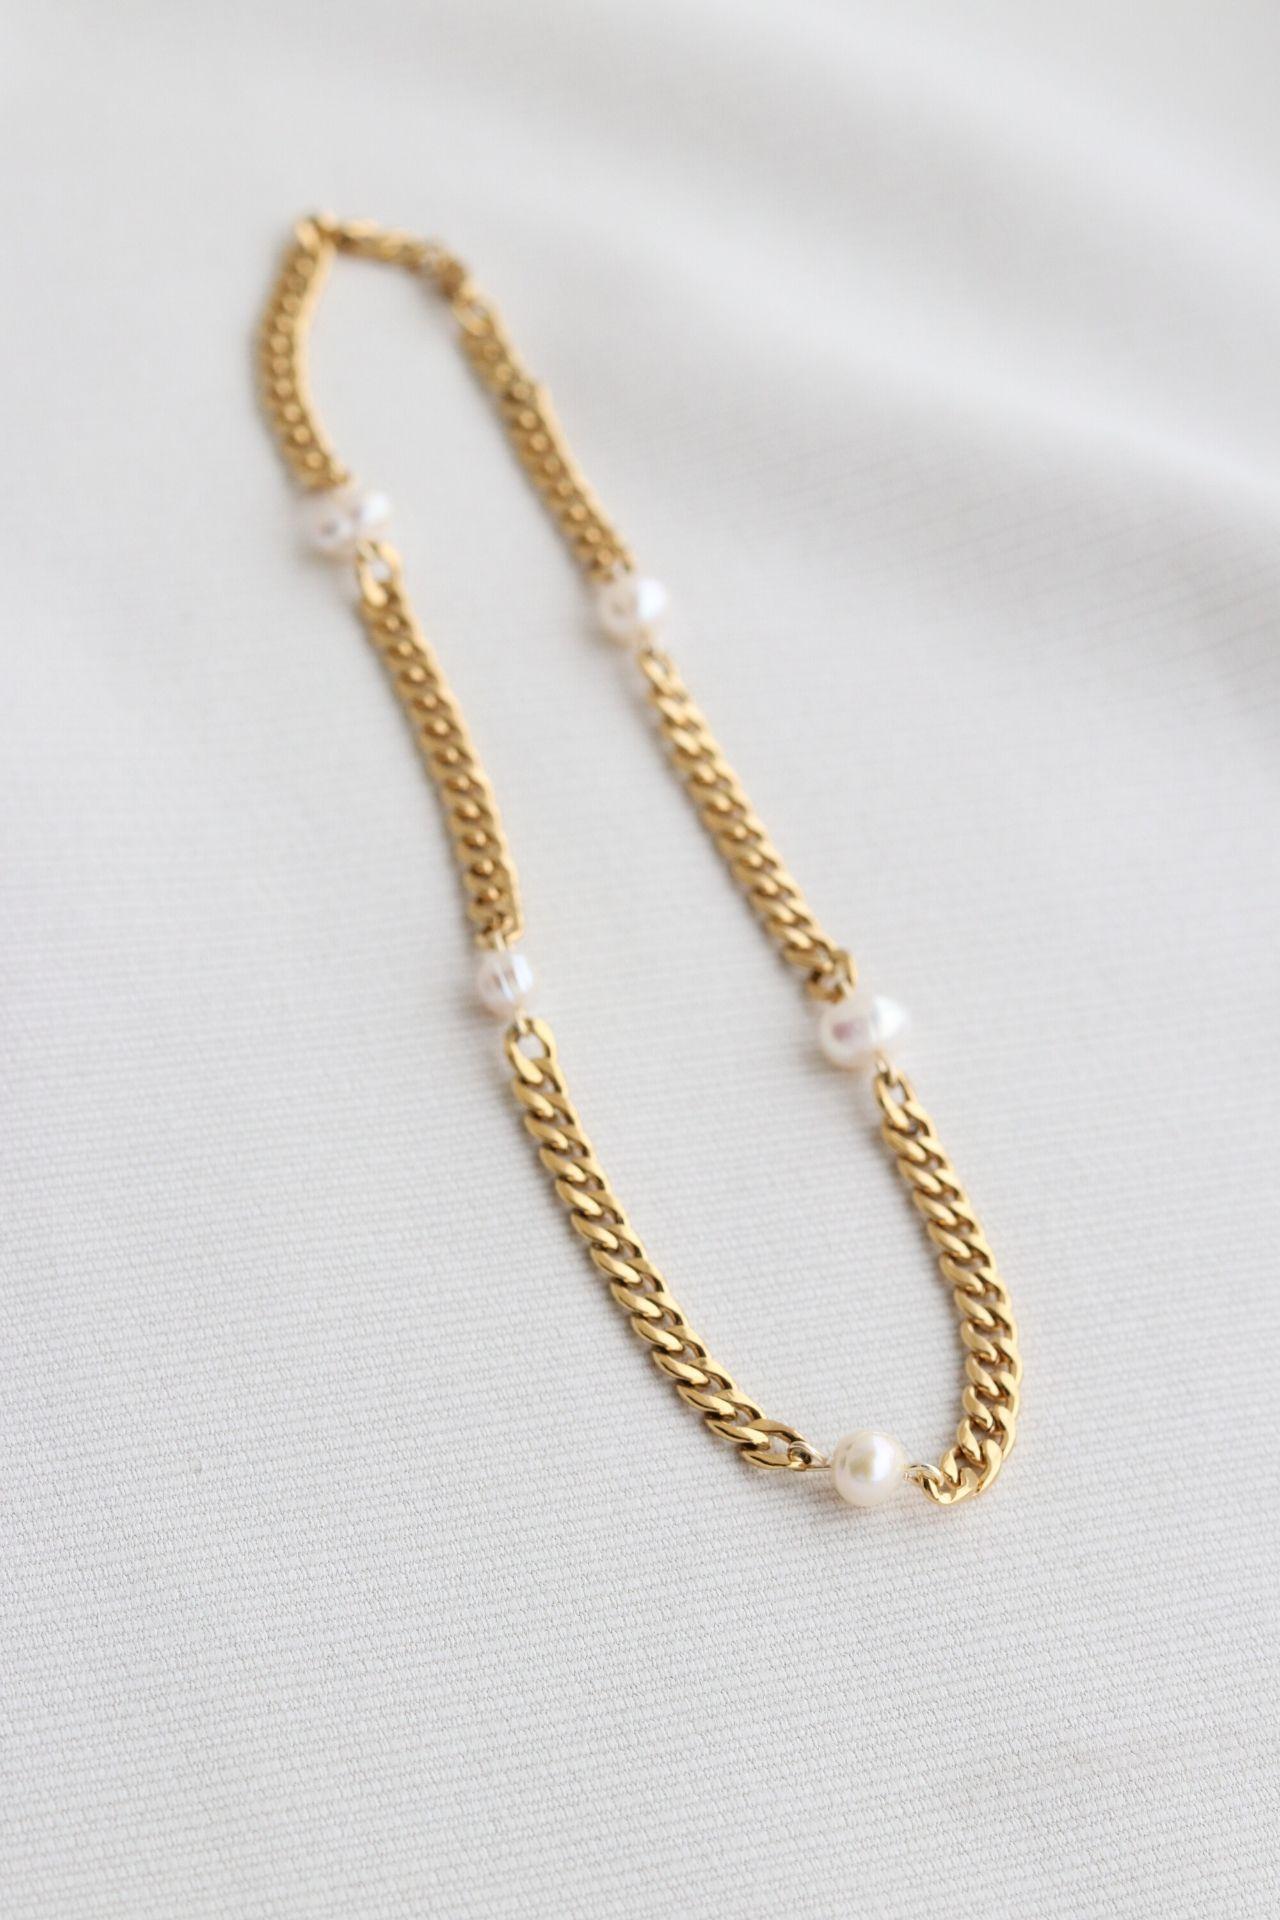 Collar de acero con perlas de río.  Tamaño: 42 cms.